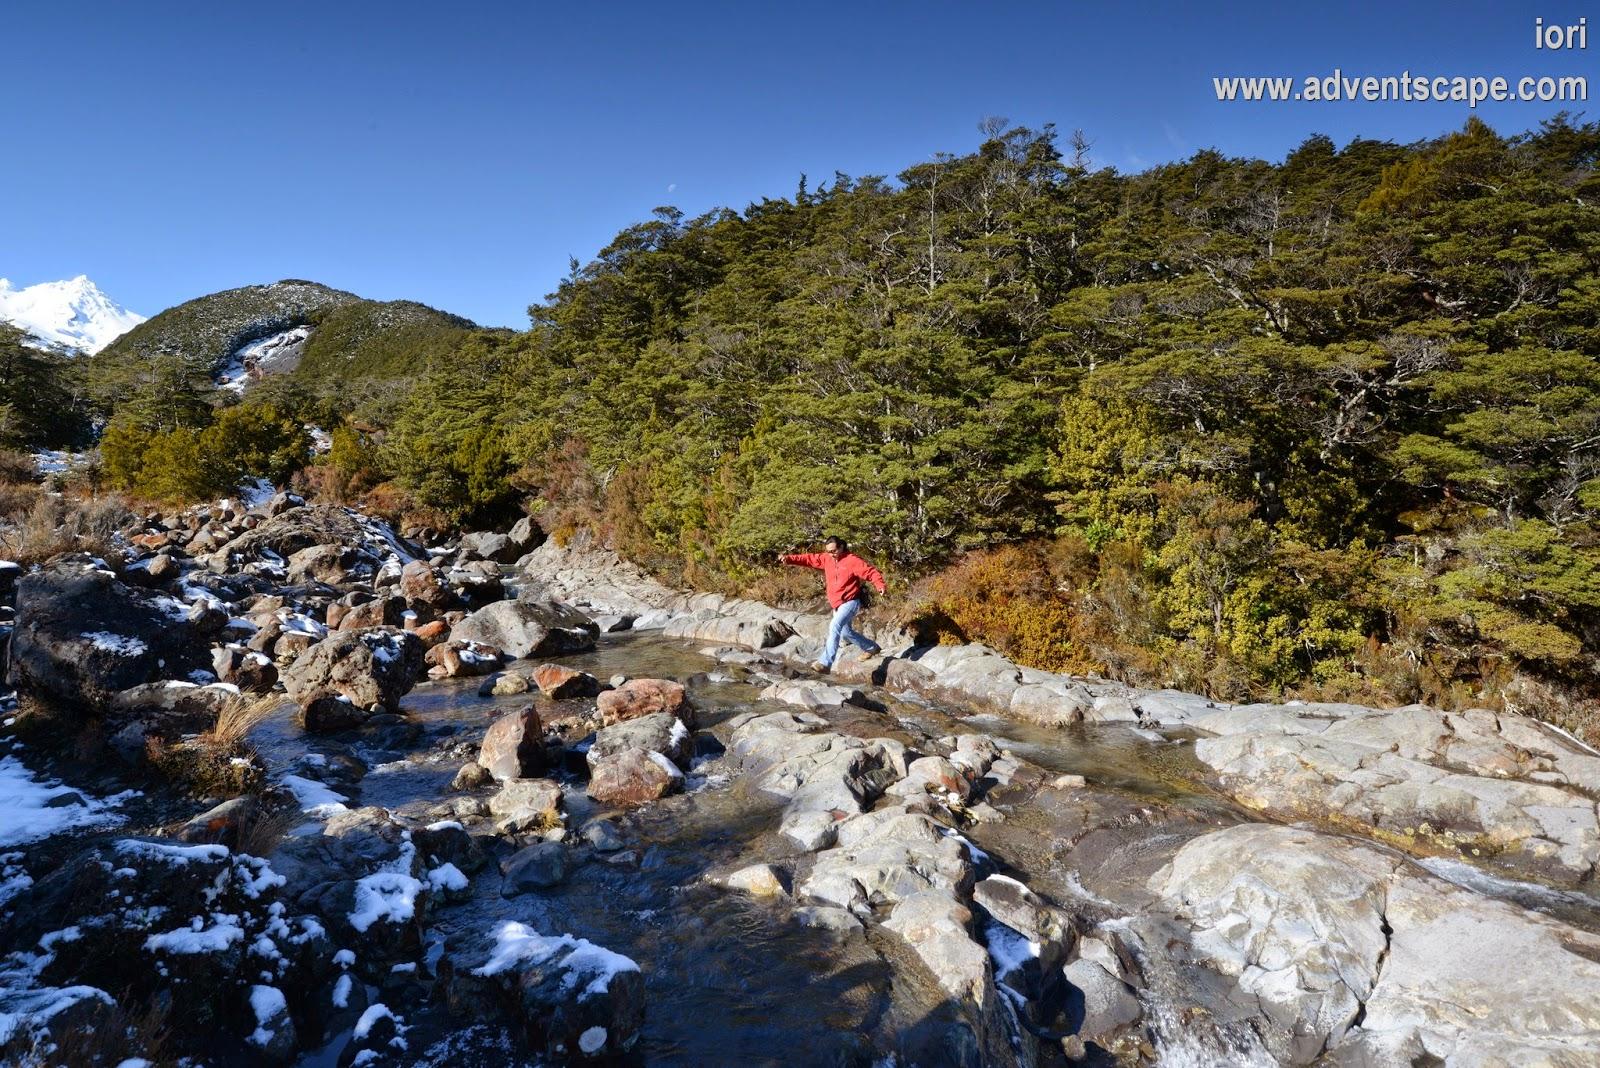 Philip Avellana, iori, adventscape, Mangawhero Falls, Mt Ruapehu, NZ, New Zealand, waterfalls, nature photos, LOTR, Lord of the Rings, filming location, Gollum